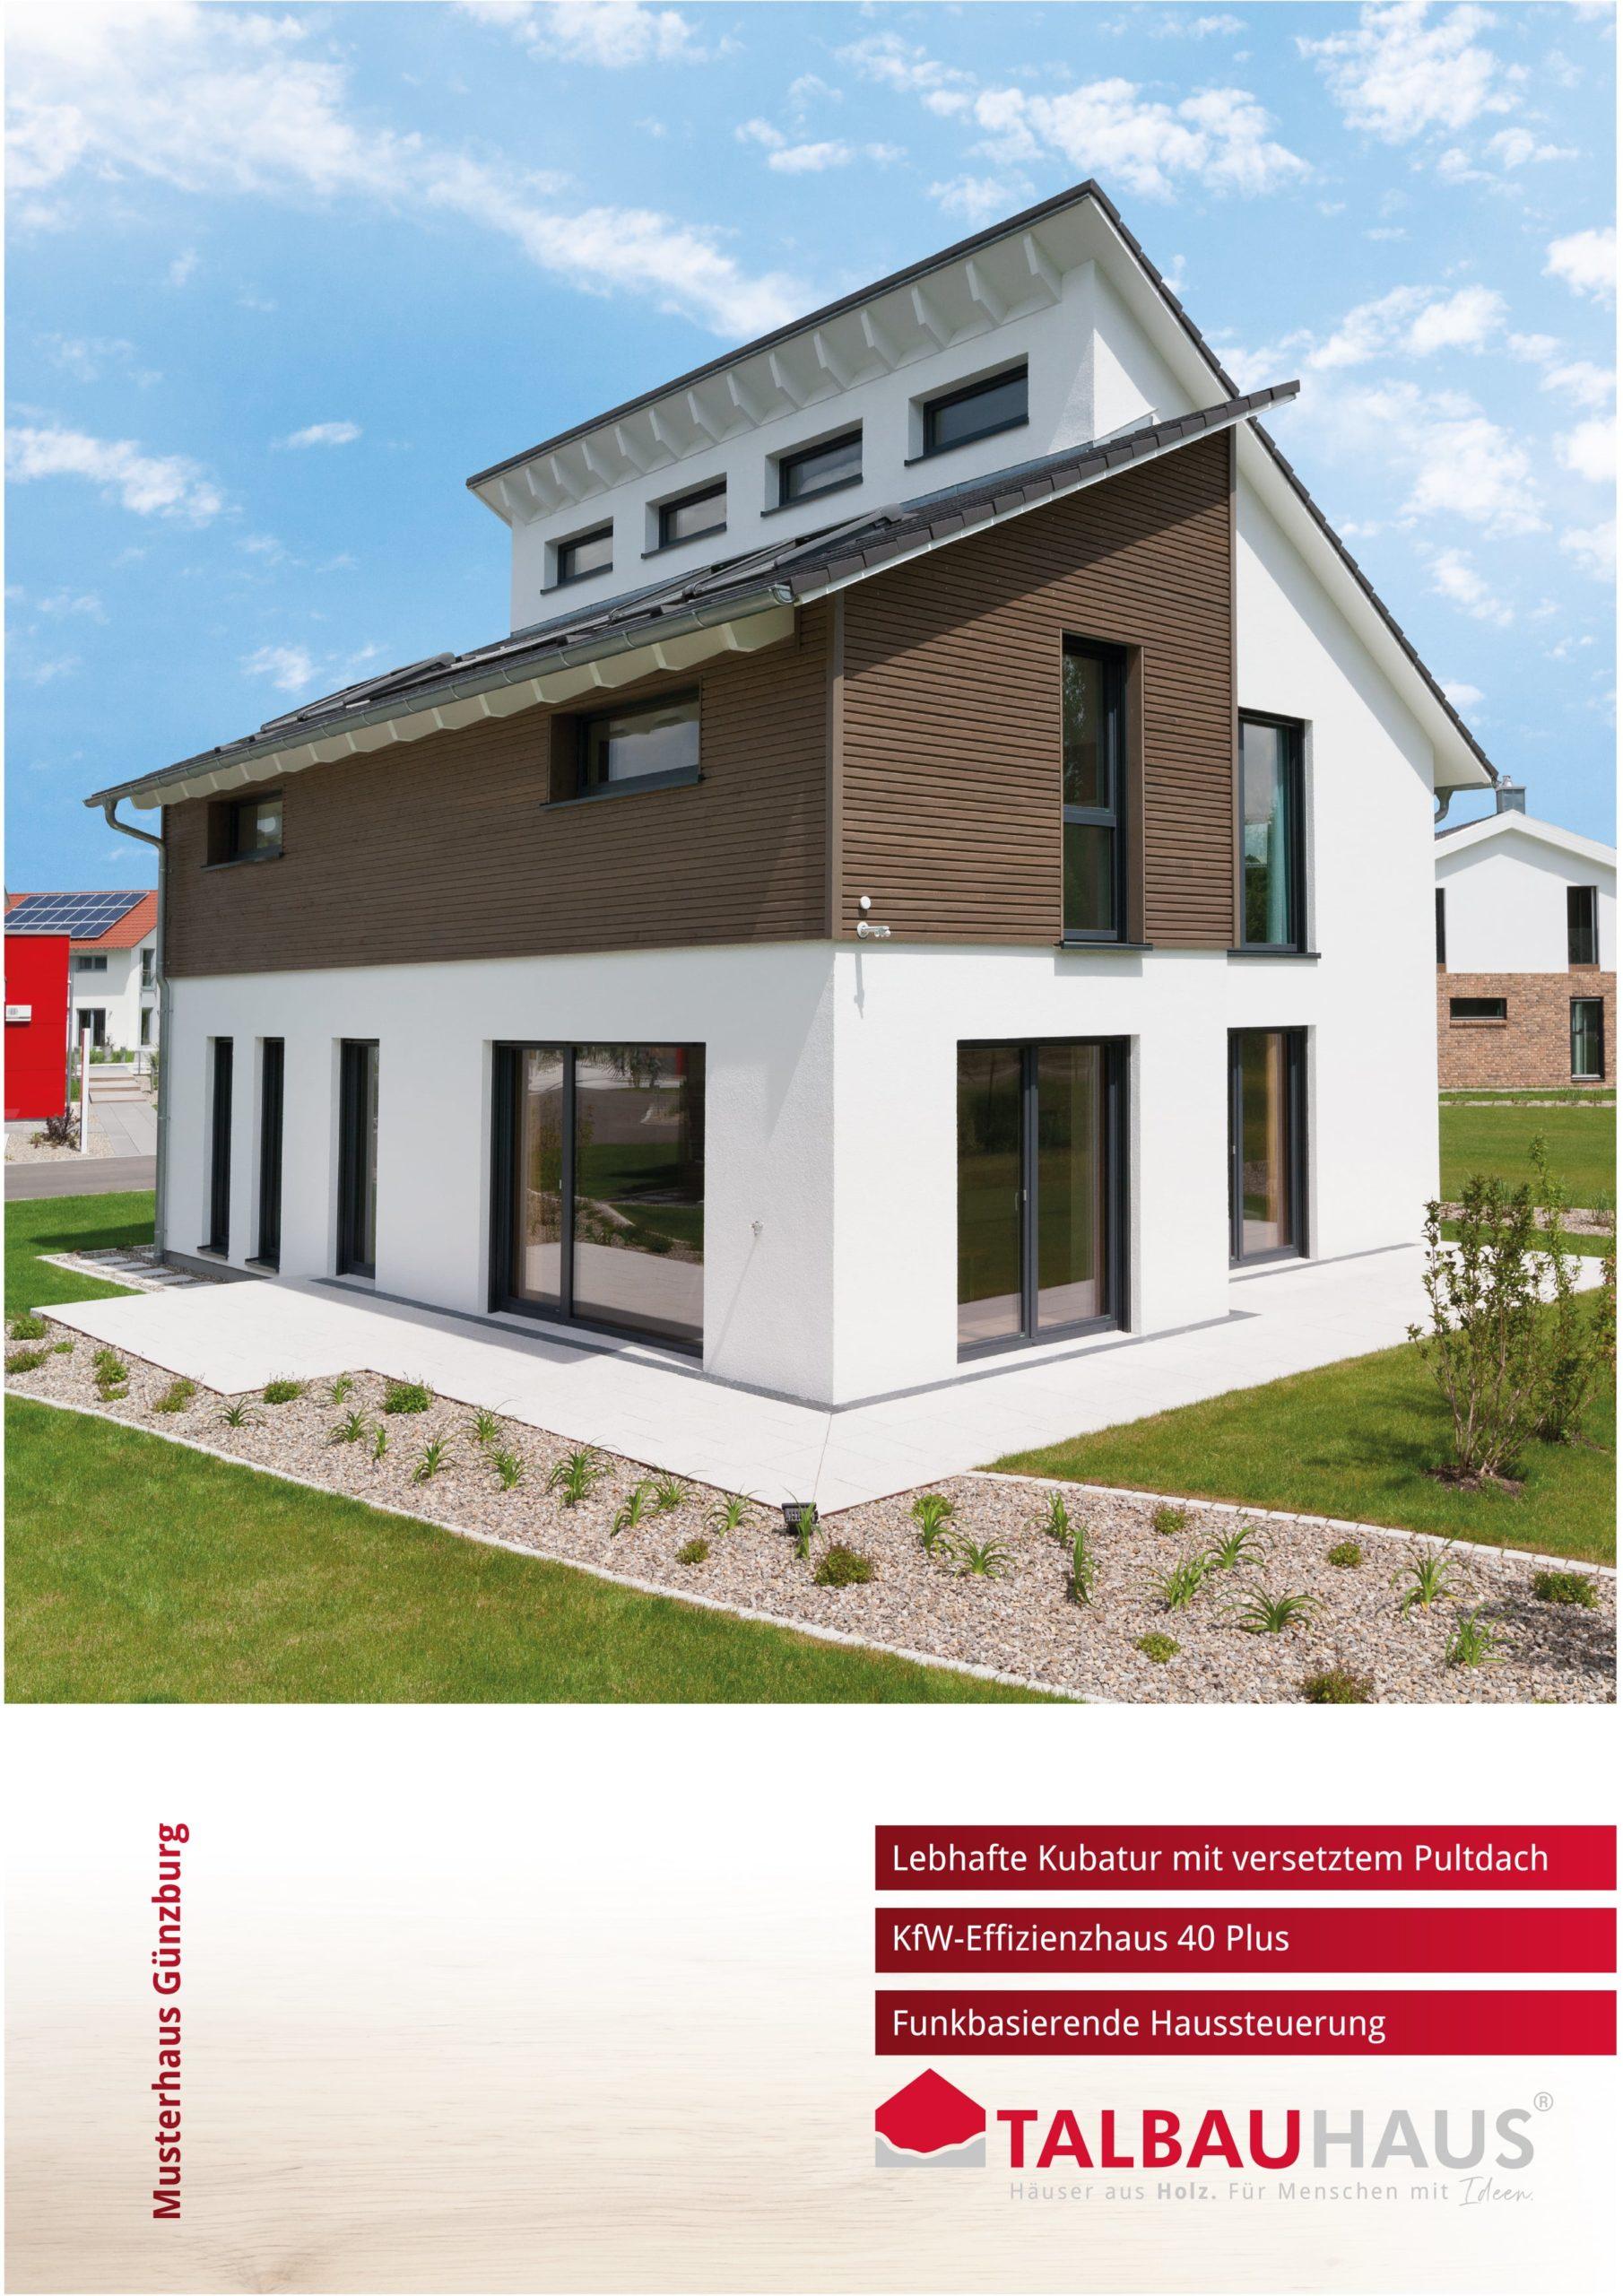 Musterhaus Günzburg download prospekt infomaterial TALBAU-Haus downloads